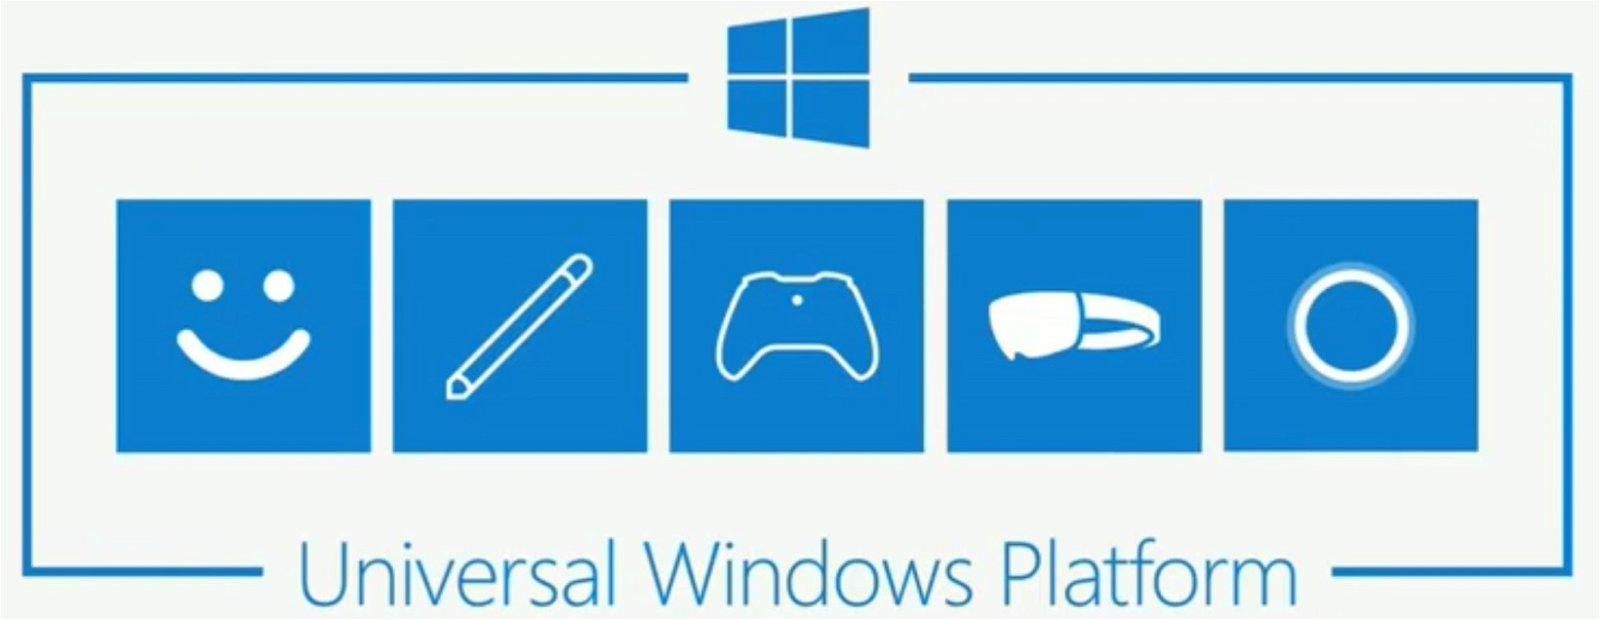 Gears Of War Developer Tells Games Industry To Oppose Microsoft